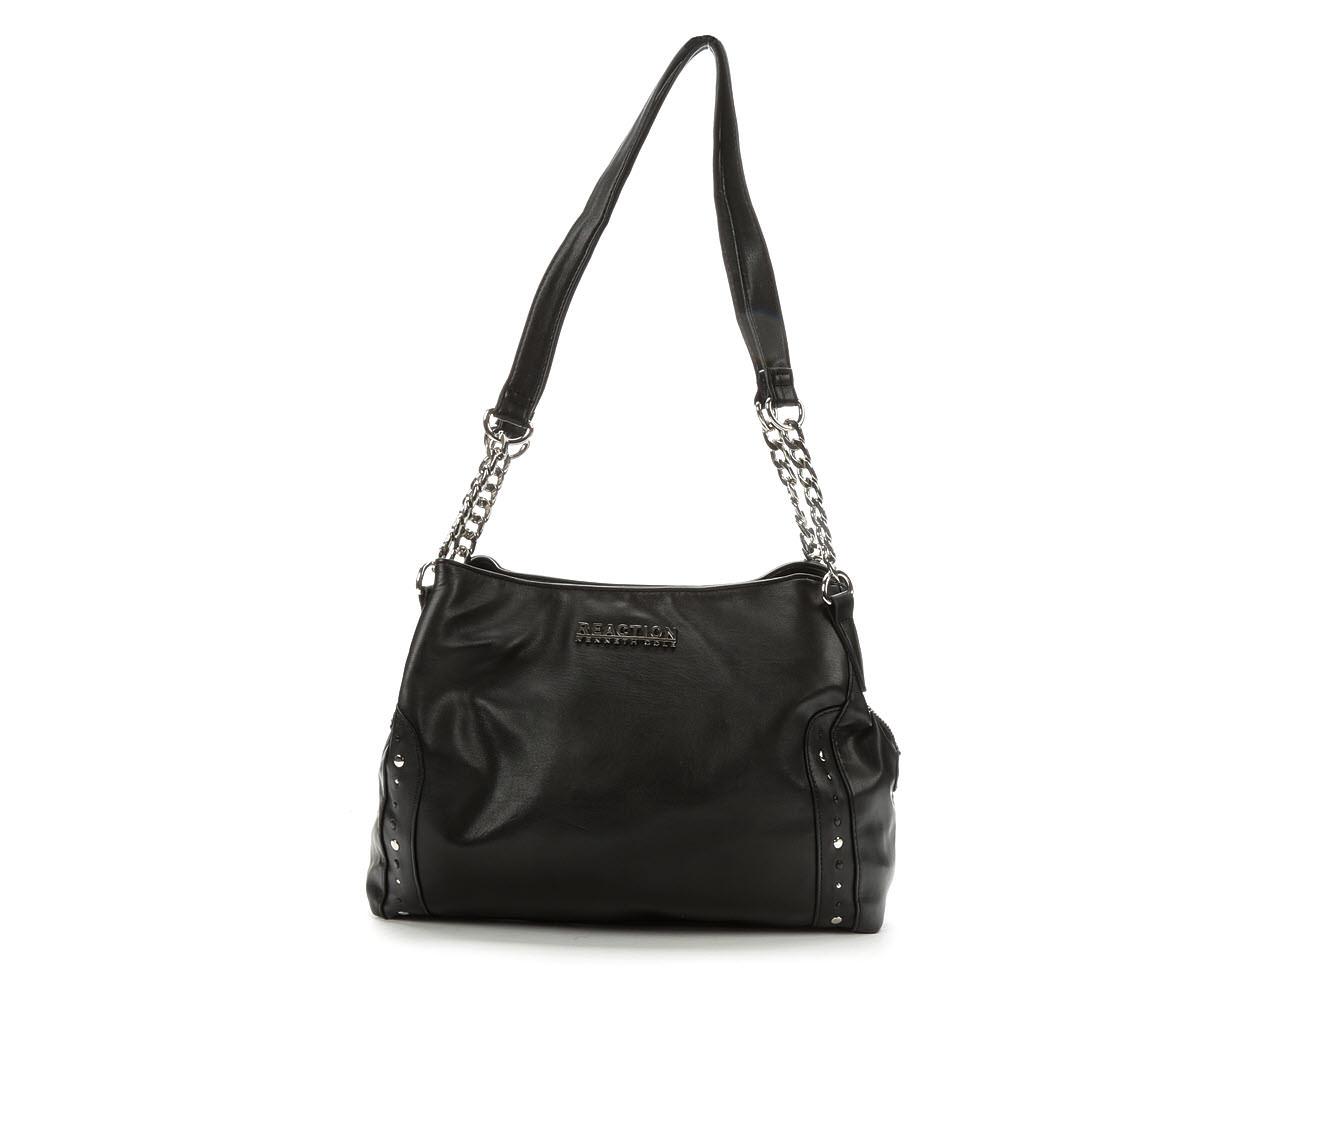 Kenneth Cole Reaction Berry Satchel Handbag (Black)